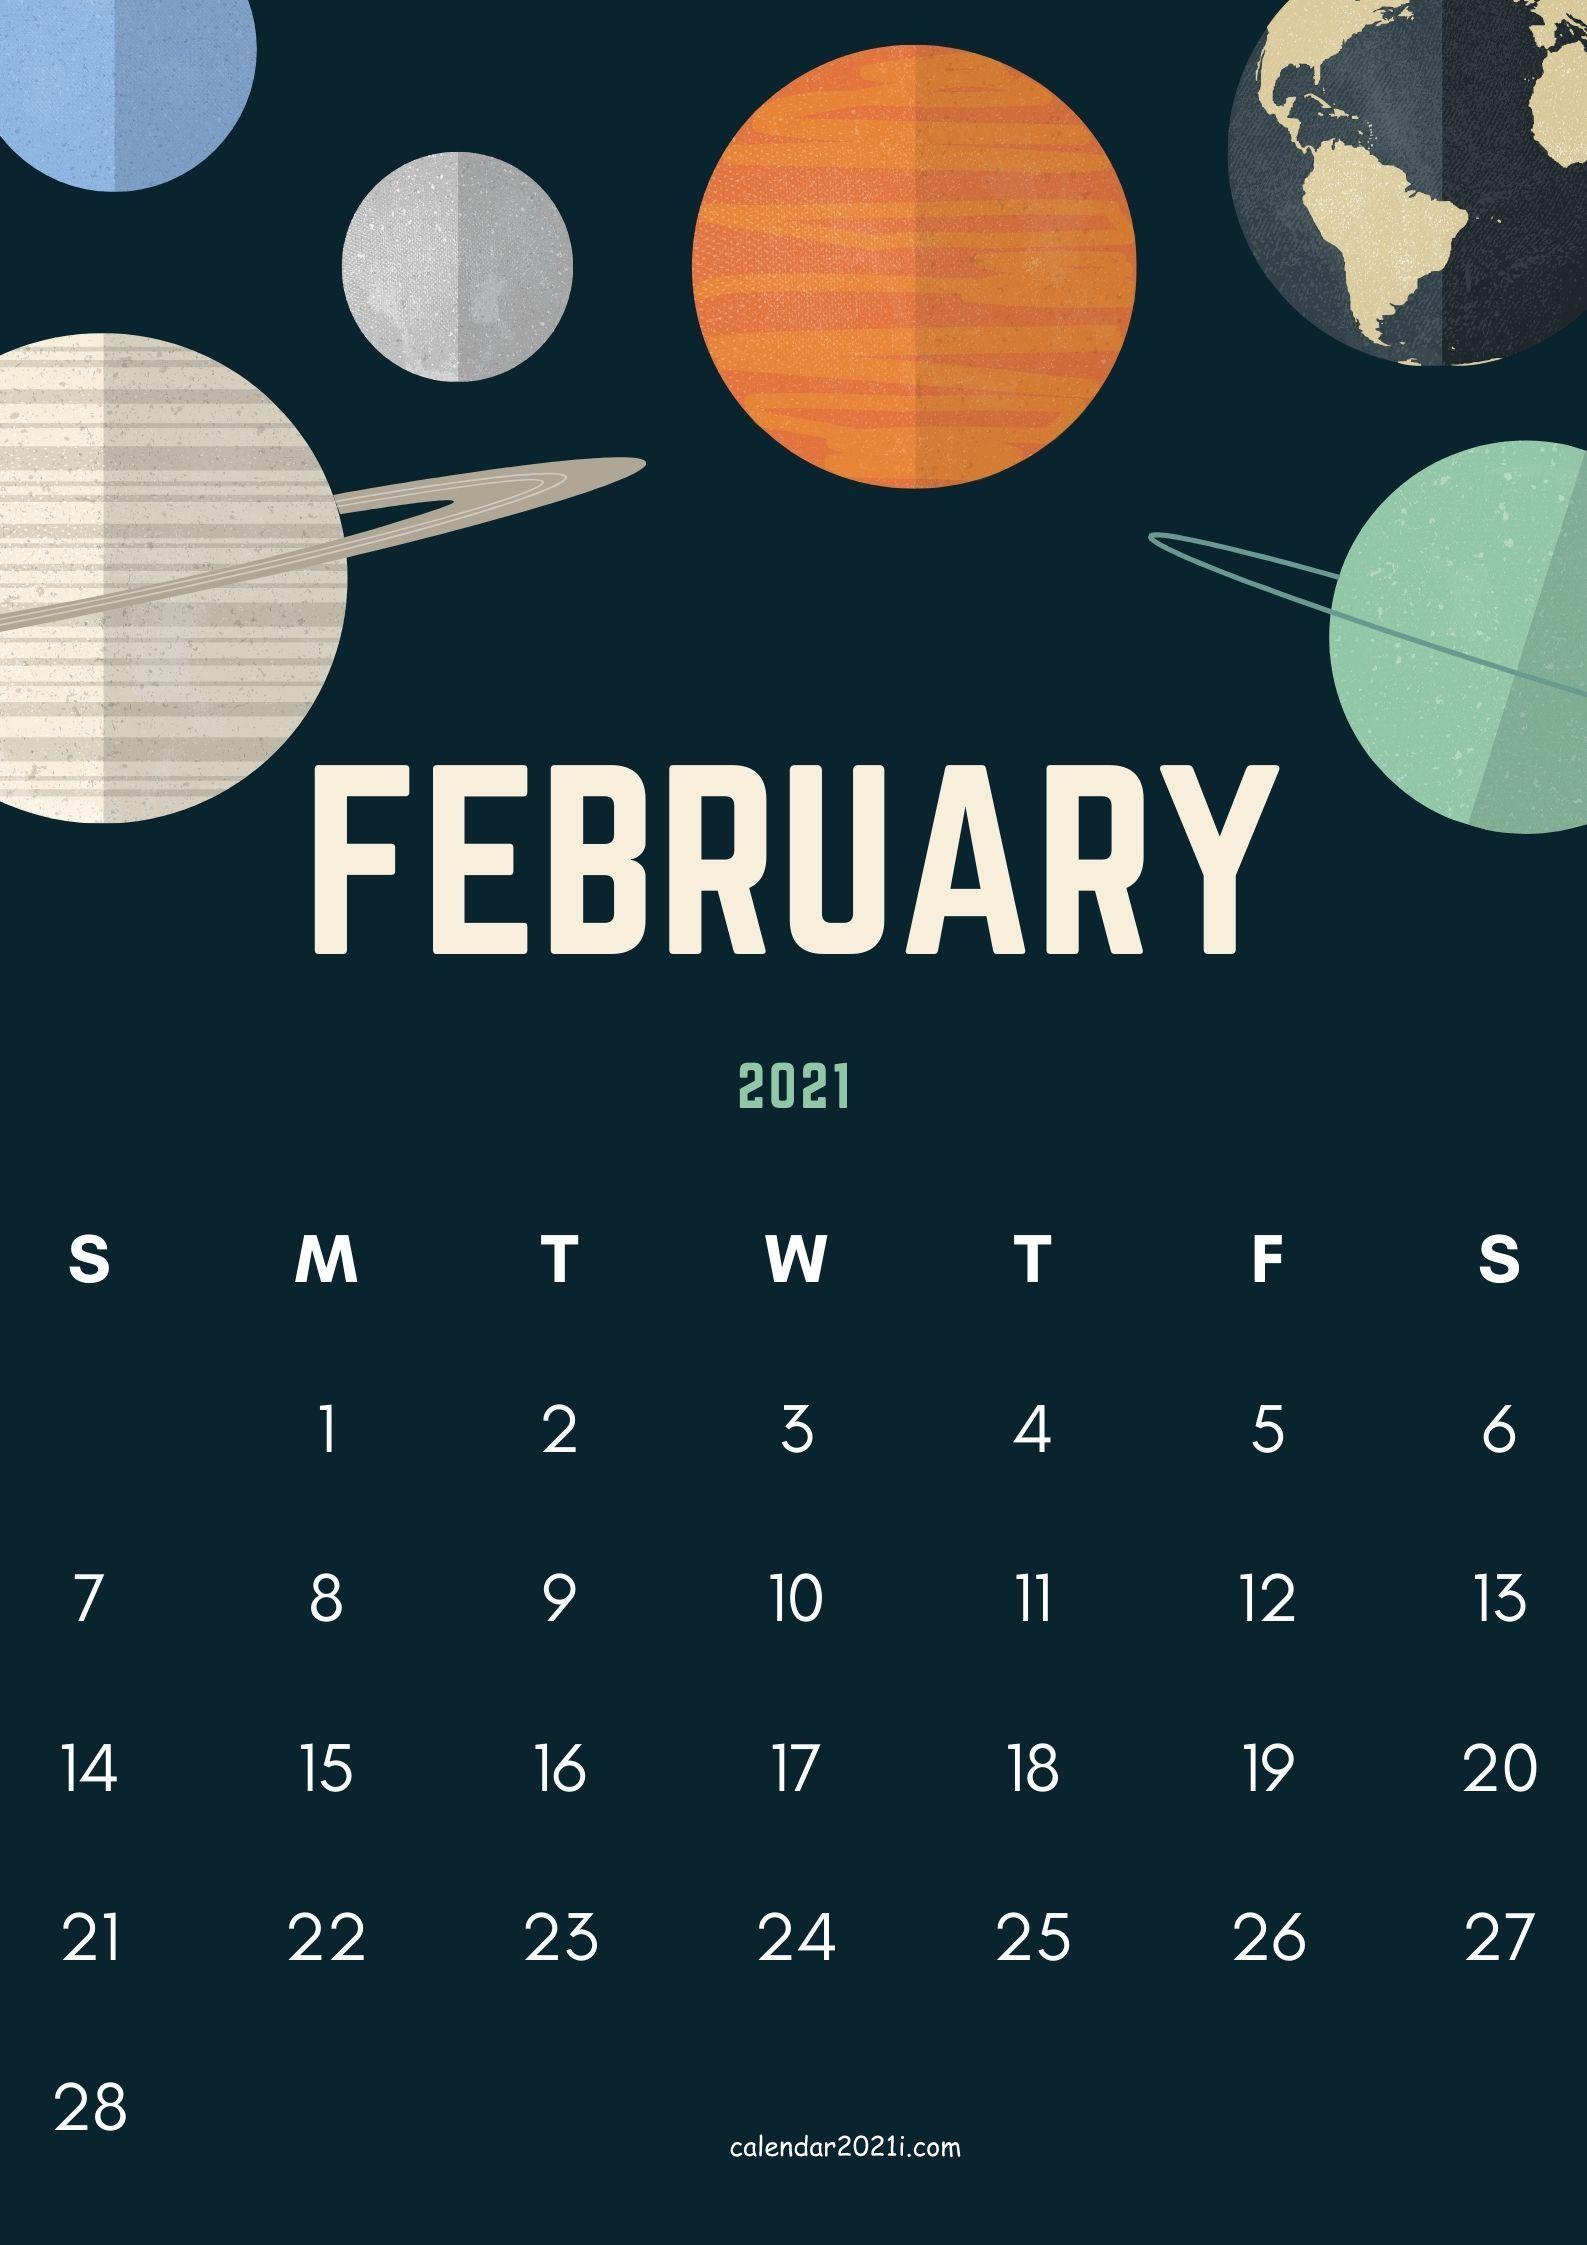 February 2021 Calendar Printable Floral Holidays Wallpaper